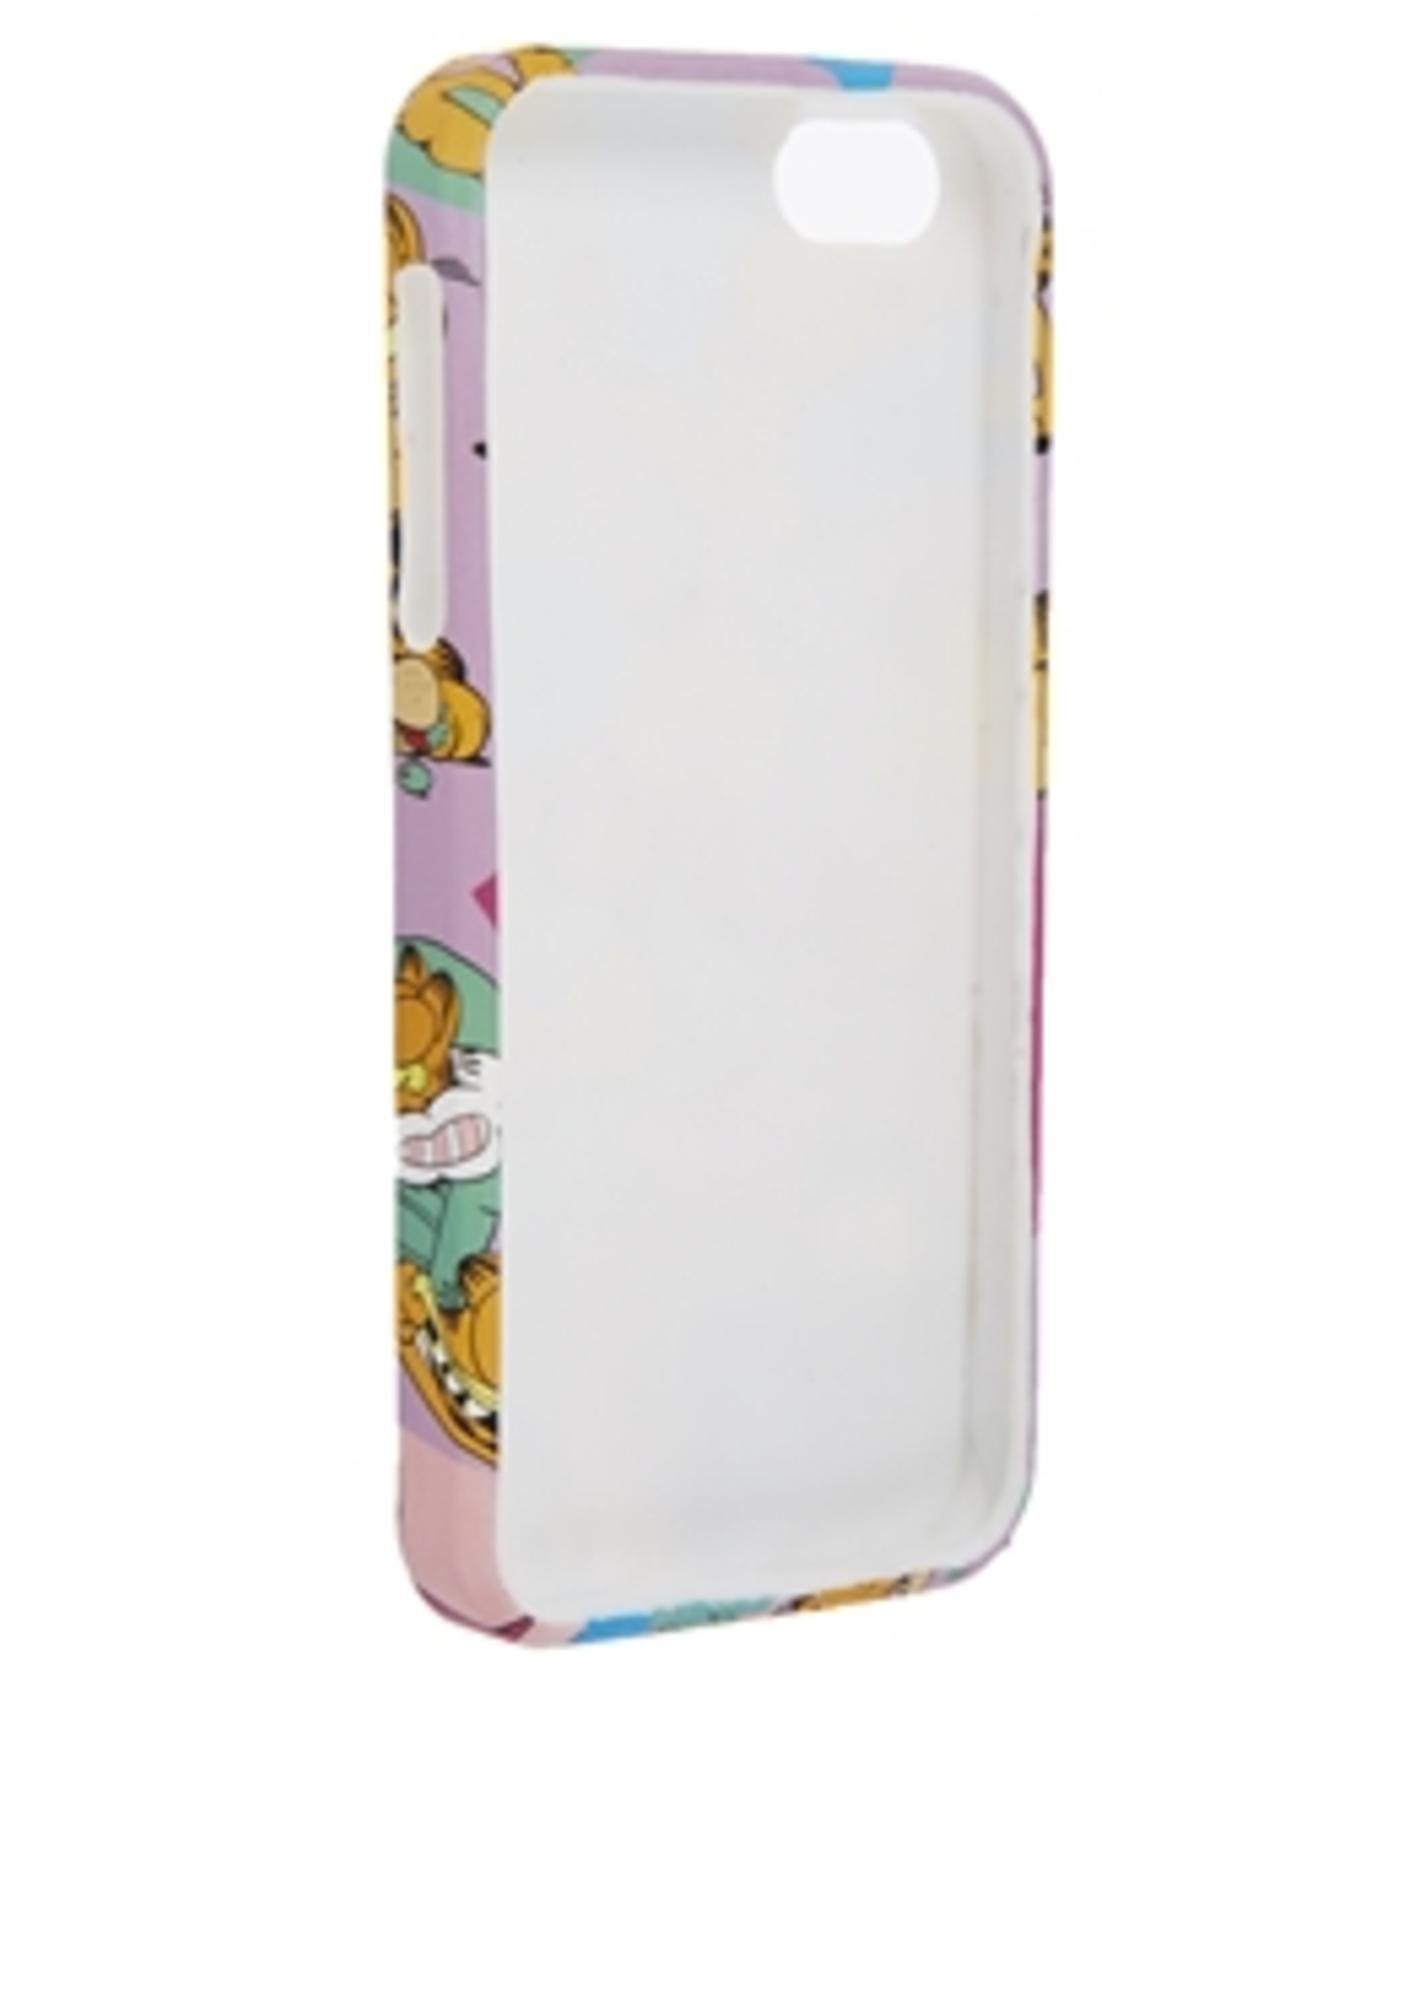 Lazy Oaf x Garfield iPhone 5 Case